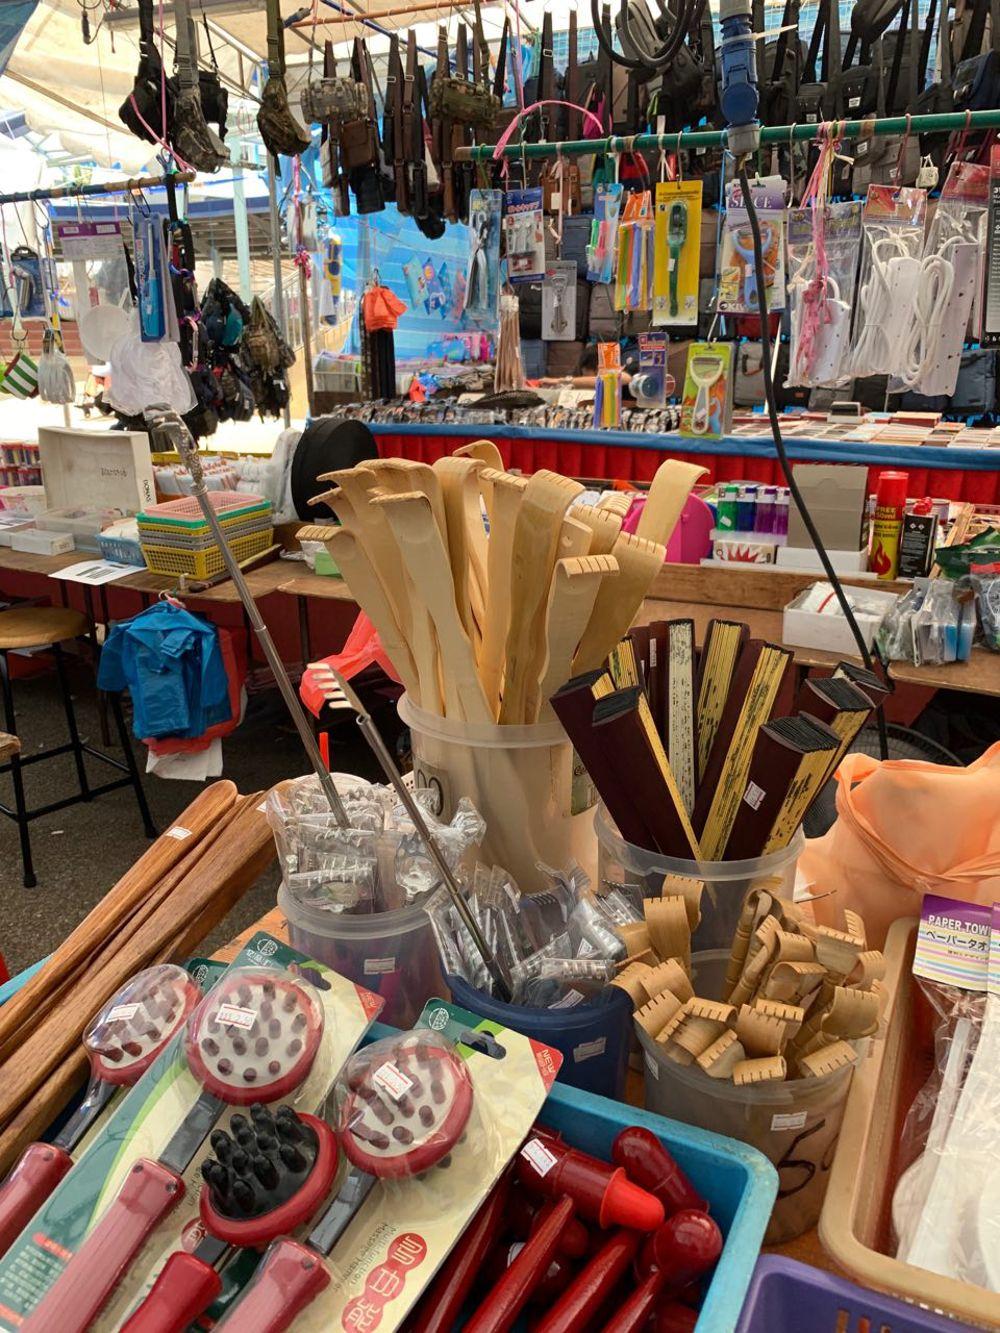 Nostalgic items wooden back scratcher